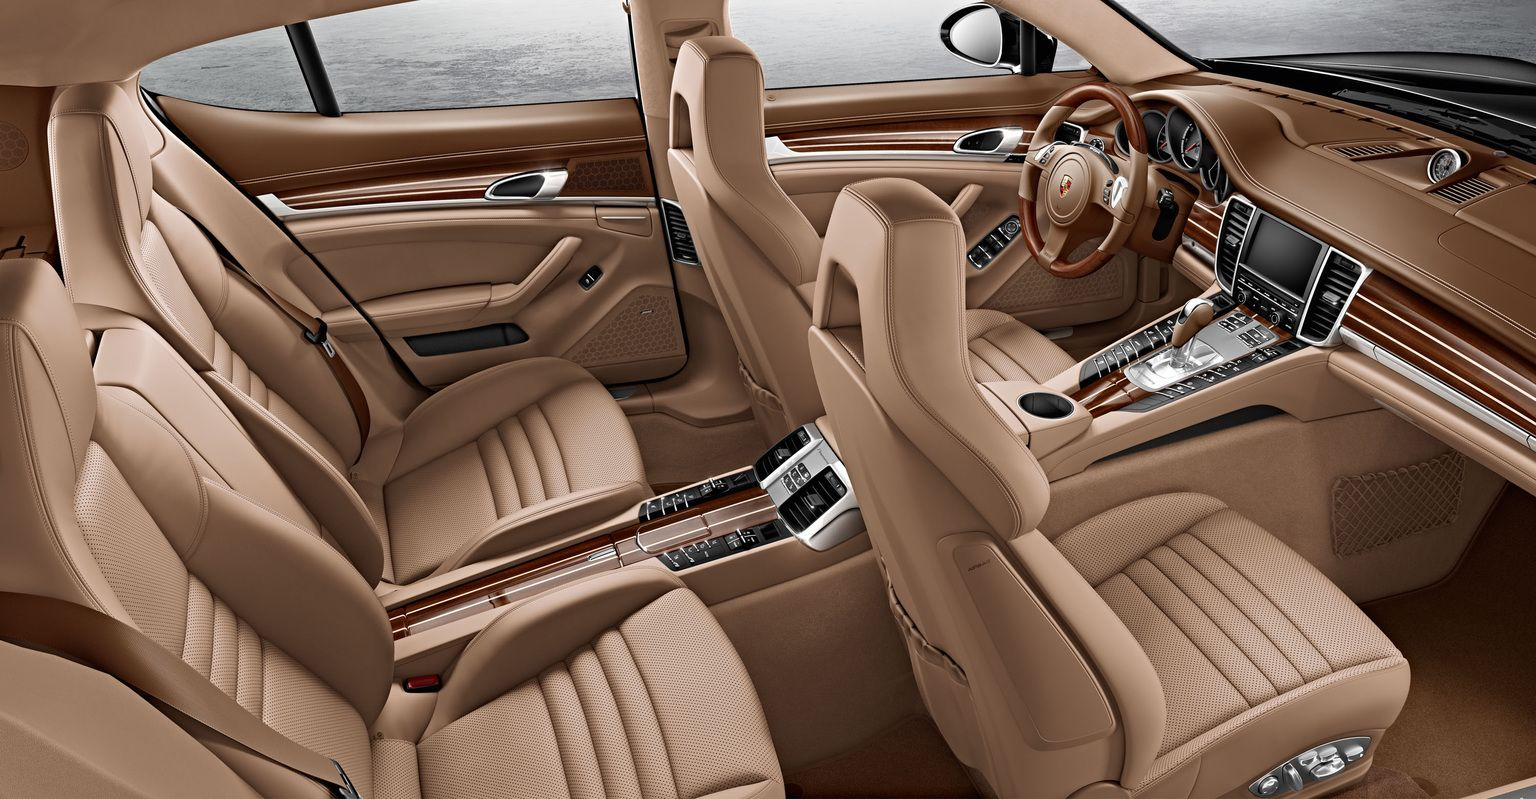 porsche panamera 2016 interior  Auto conception  Pinterest